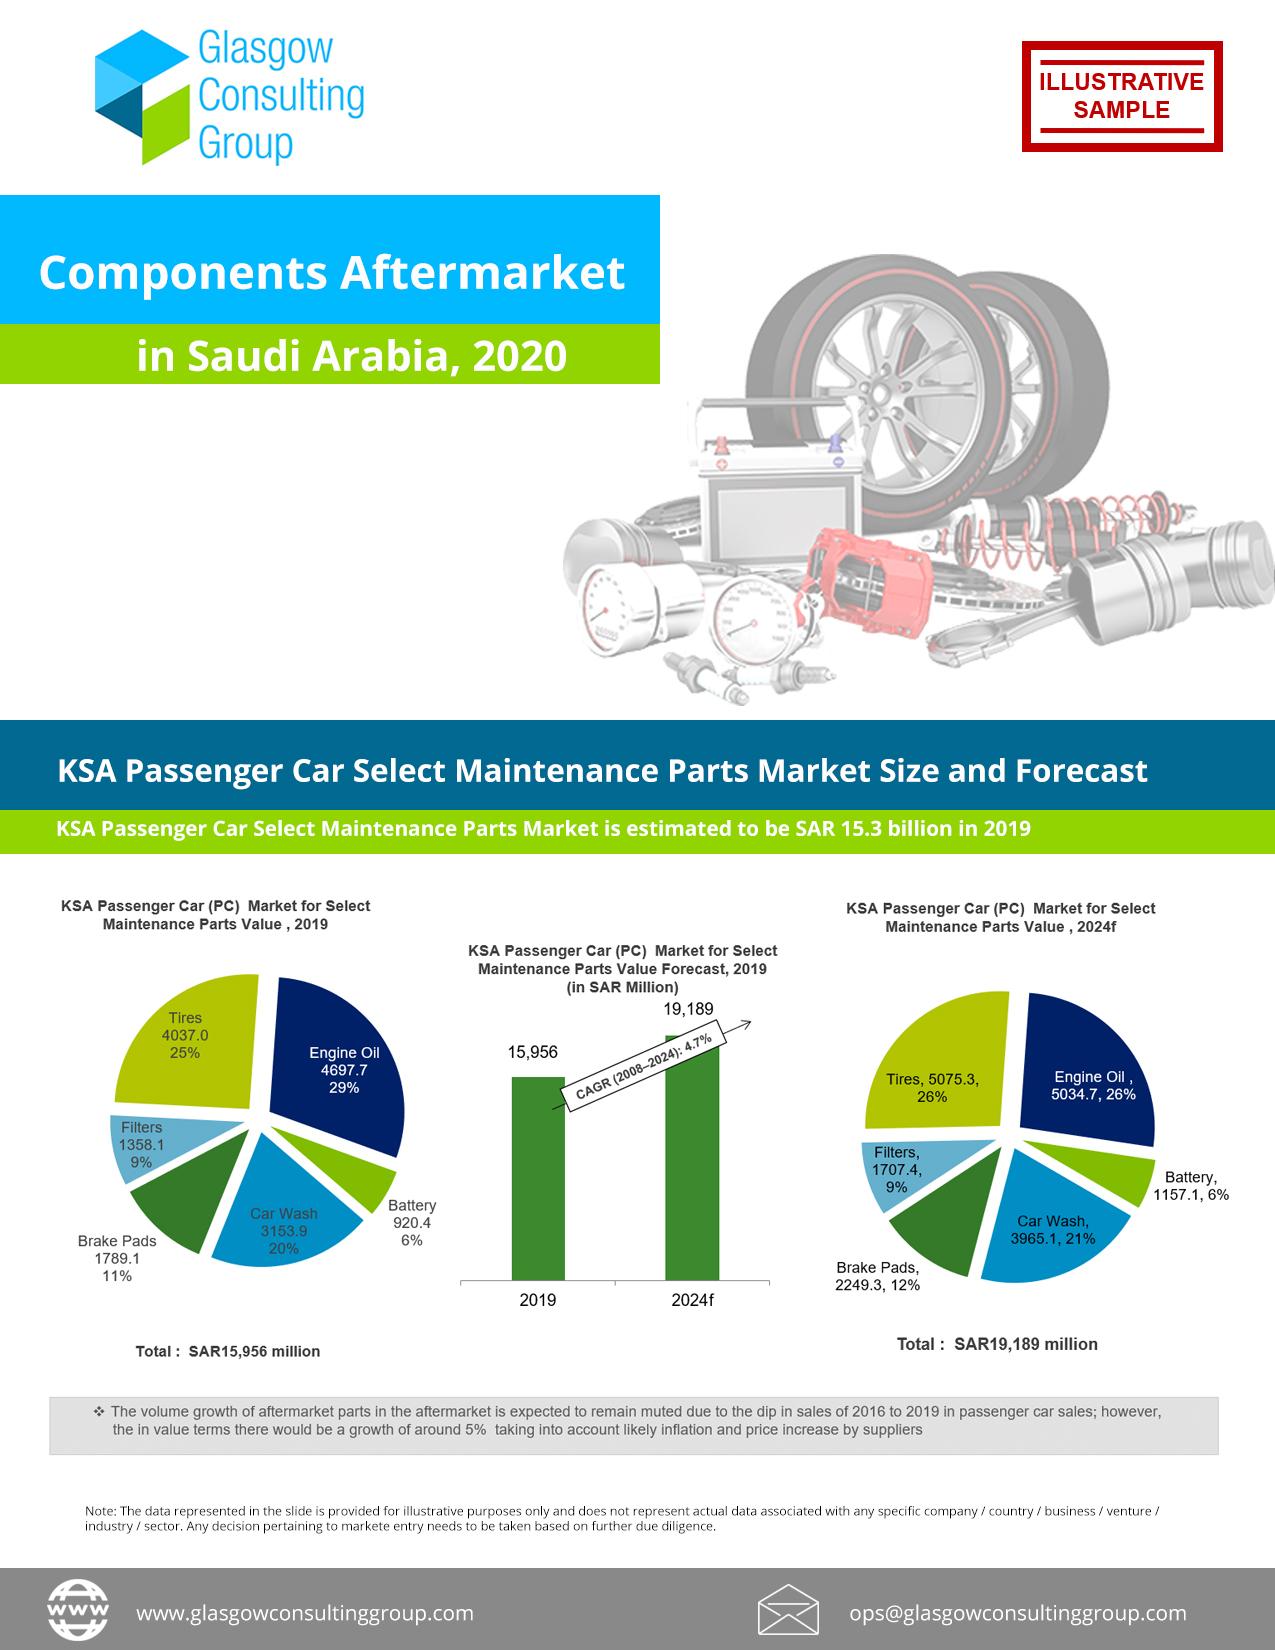 Components Aftermarket in Saudi Arabia, 2020